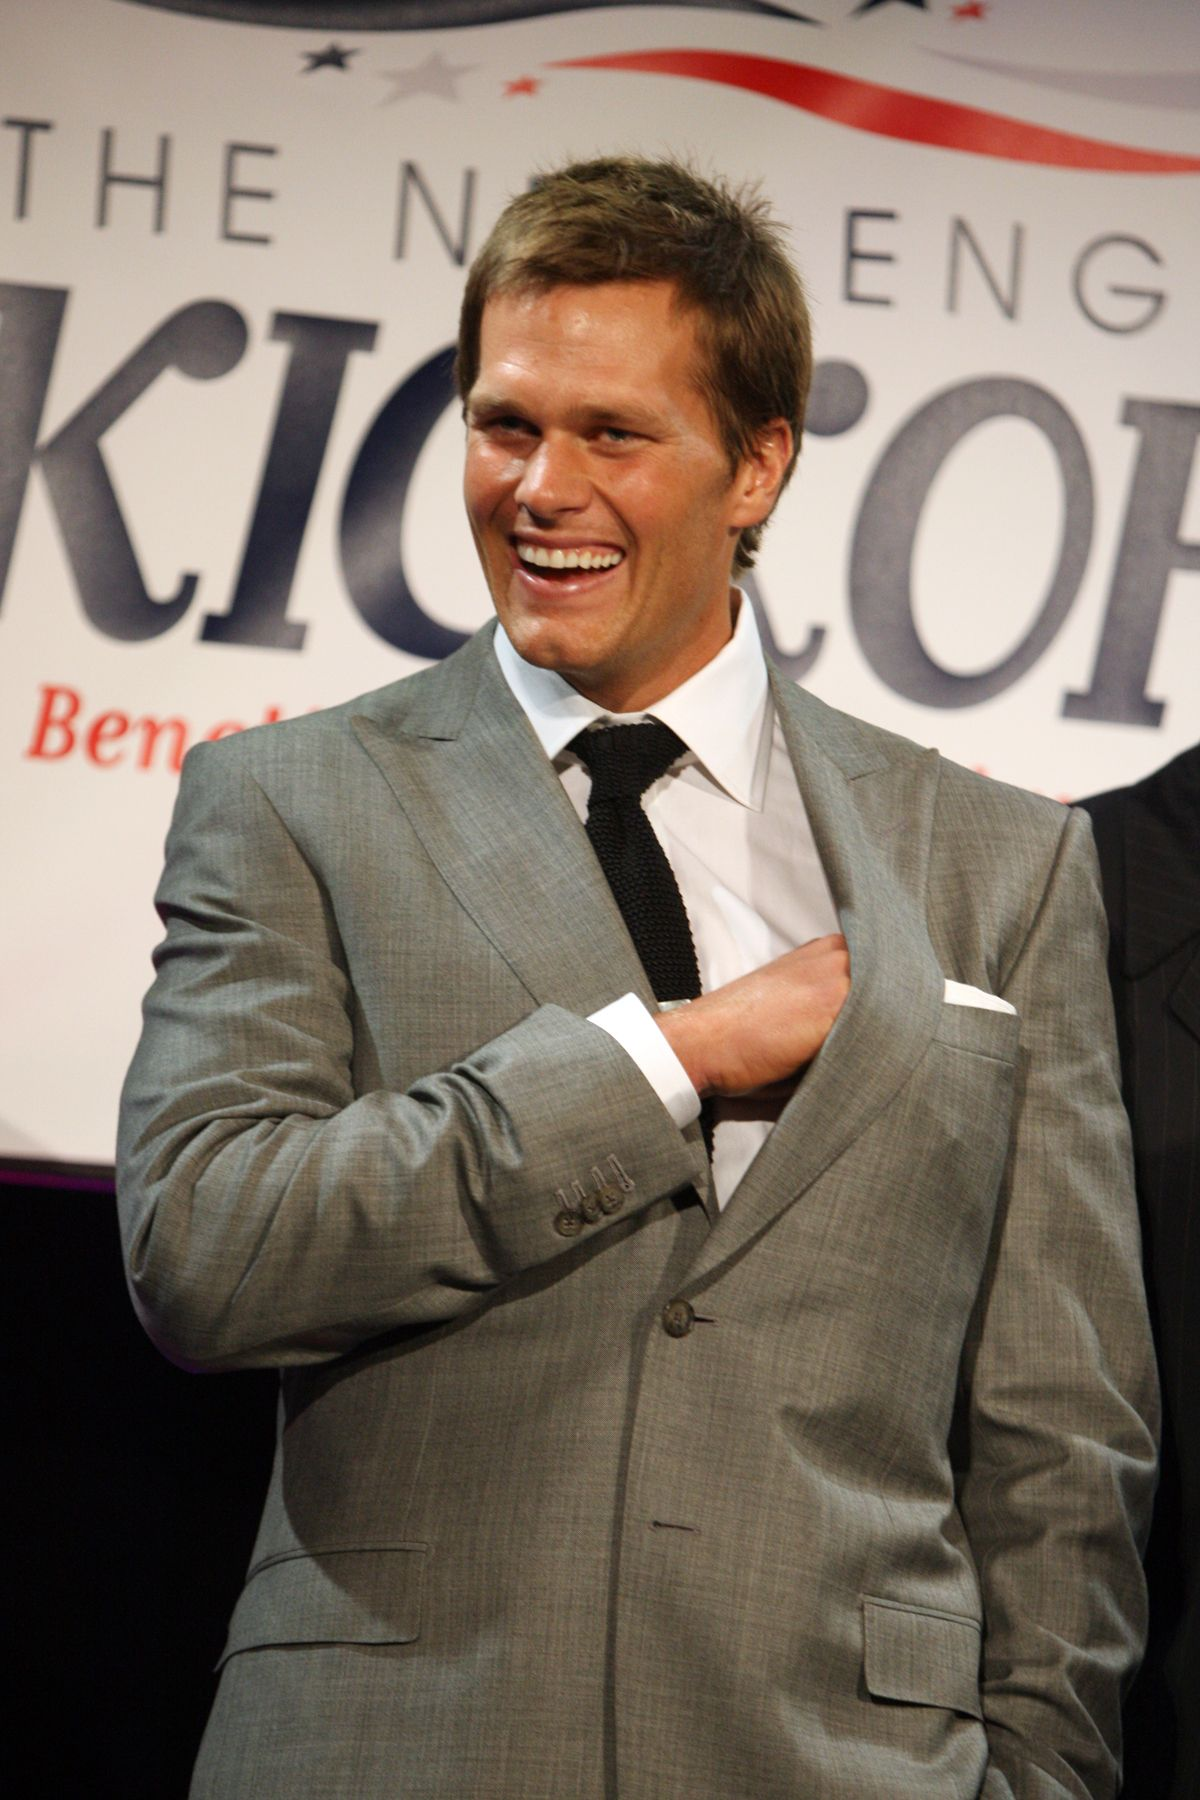 Brady At The Annual Kickoff Gala Tom Brady New England Patriots Patriots Football